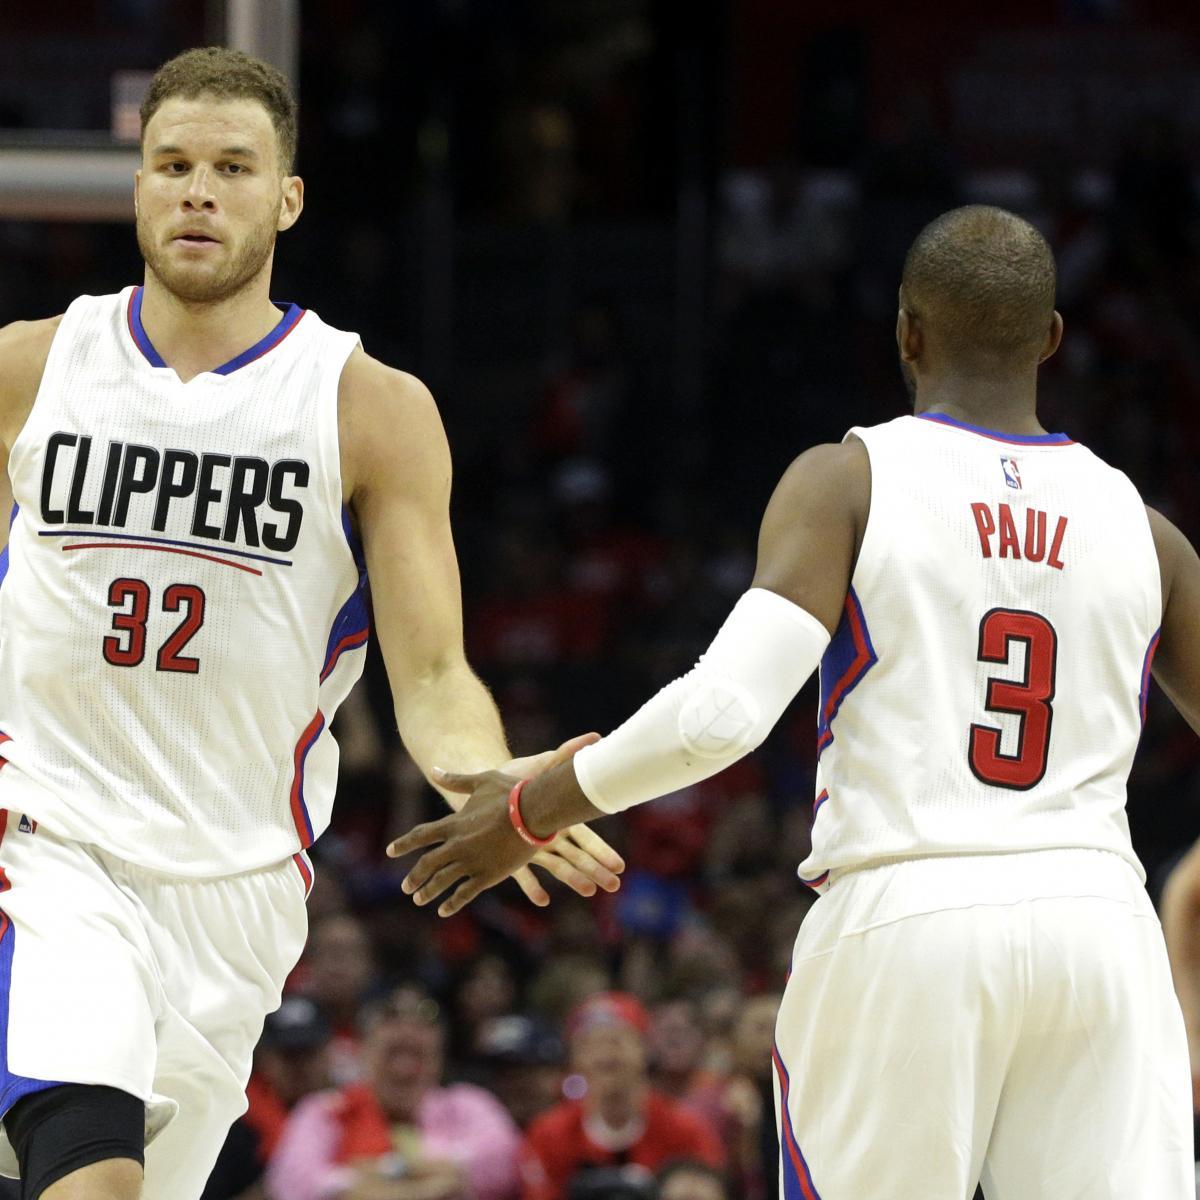 Portland Blazers Game Score: Trail Blazers Vs Clippers: Game 2 Score, Twitter Reaction